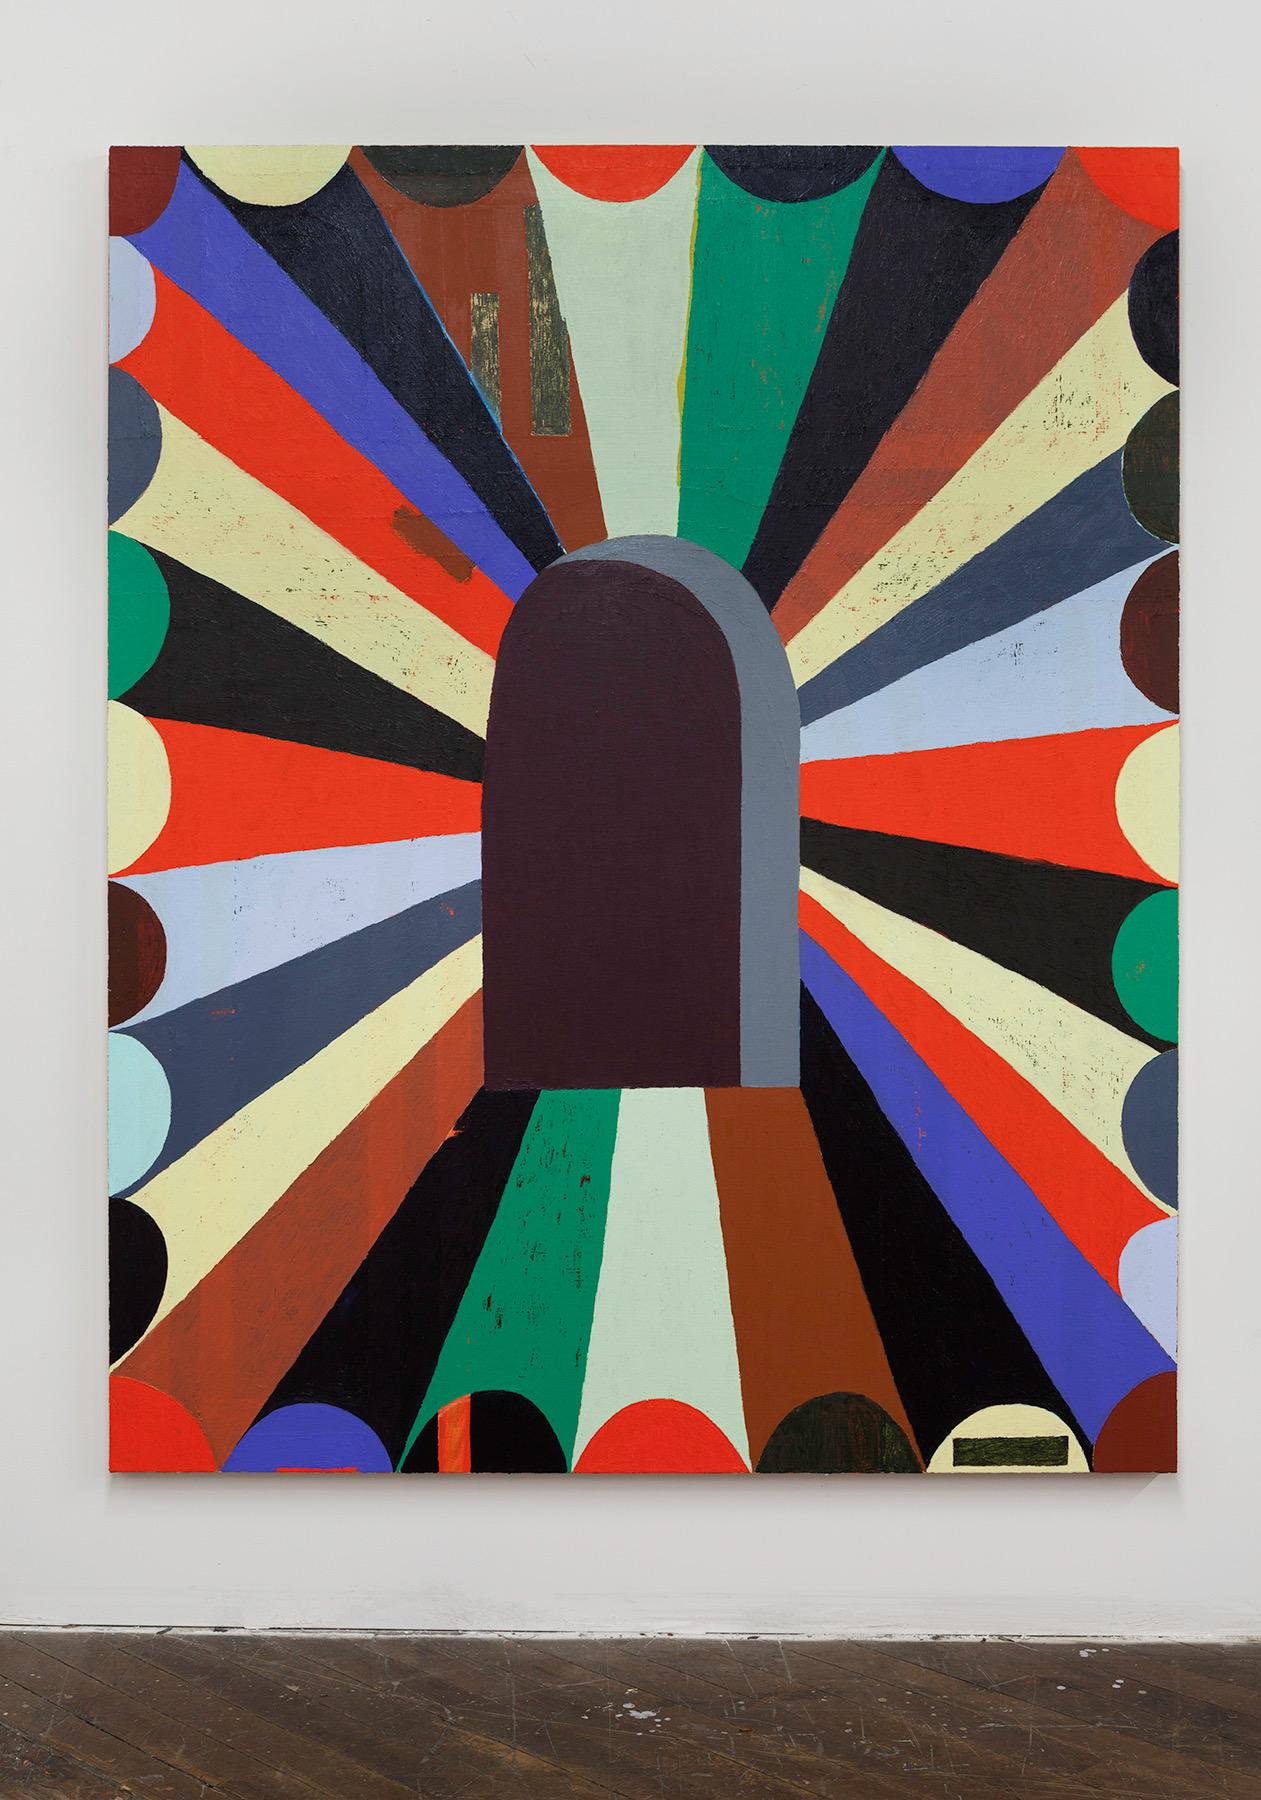 Matt Kleberg,37th Hour,2017,oil stick on canvas,72 x 58 inches